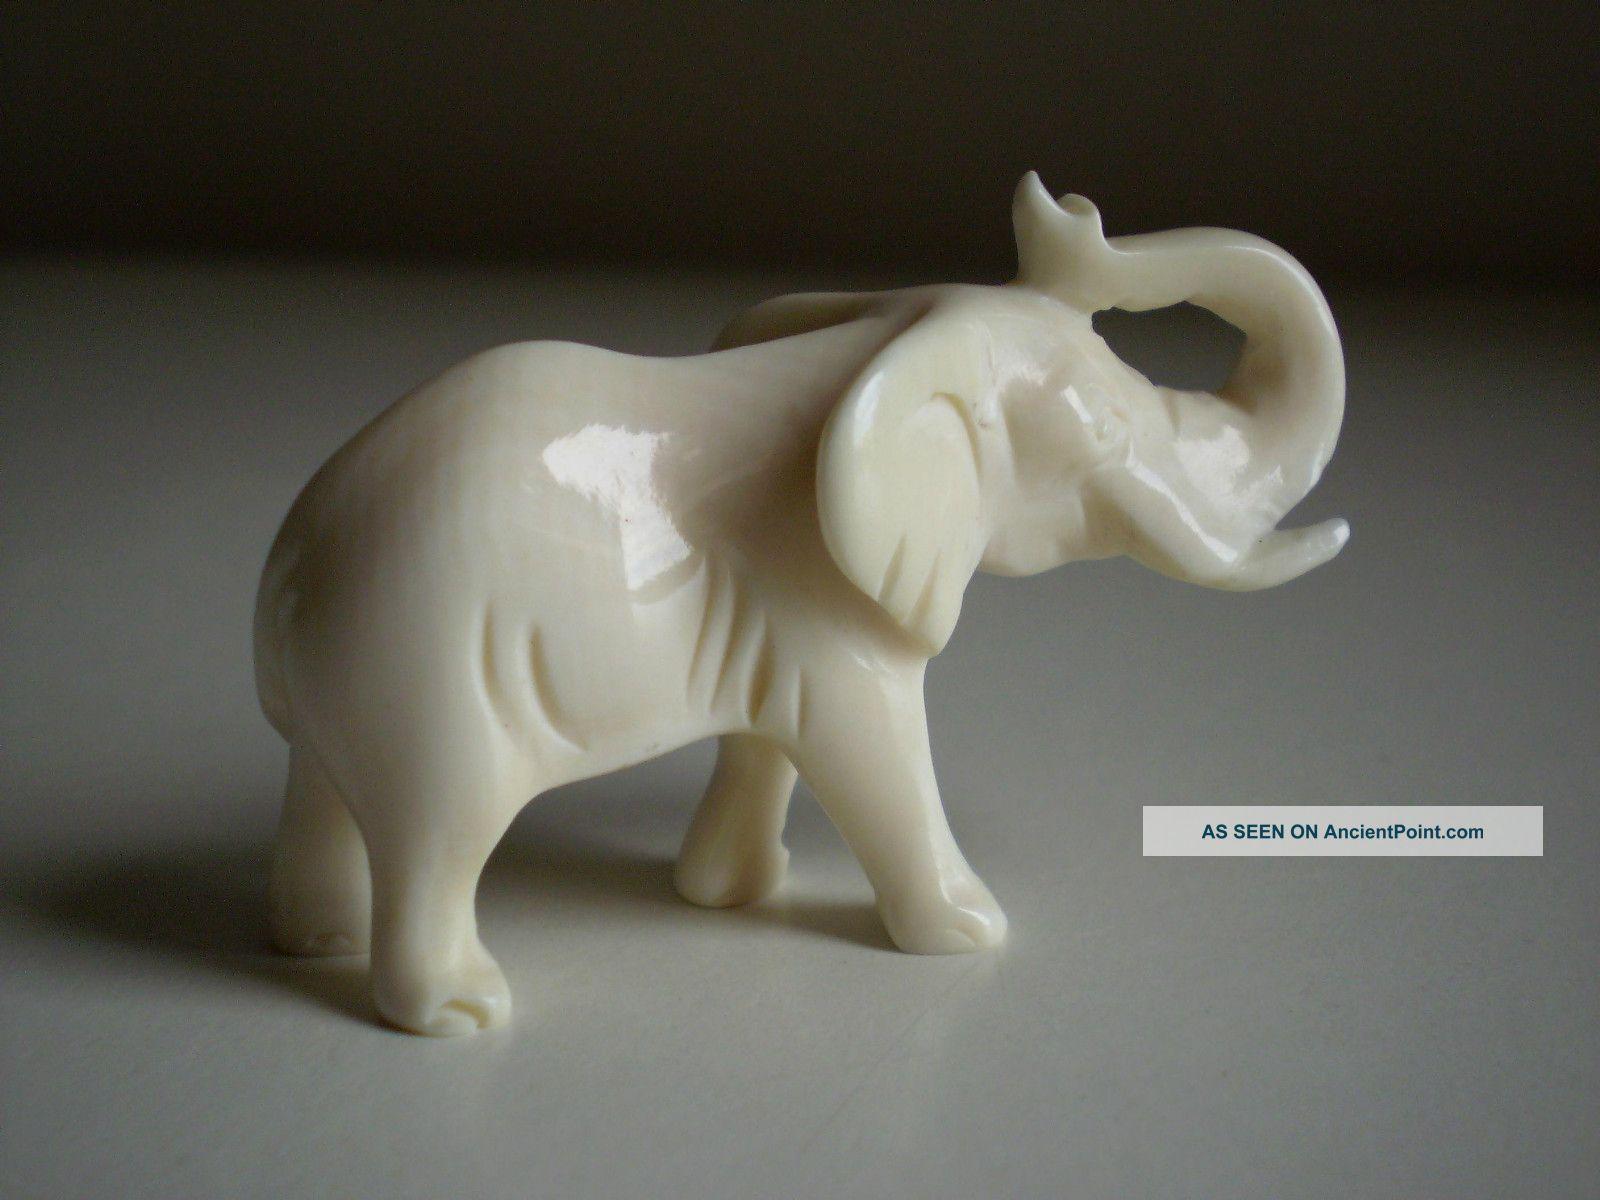 Antique Vtg Ox Bone Faux Ivory Carved Elephant Figurine Statue Sculptures & Statues photo